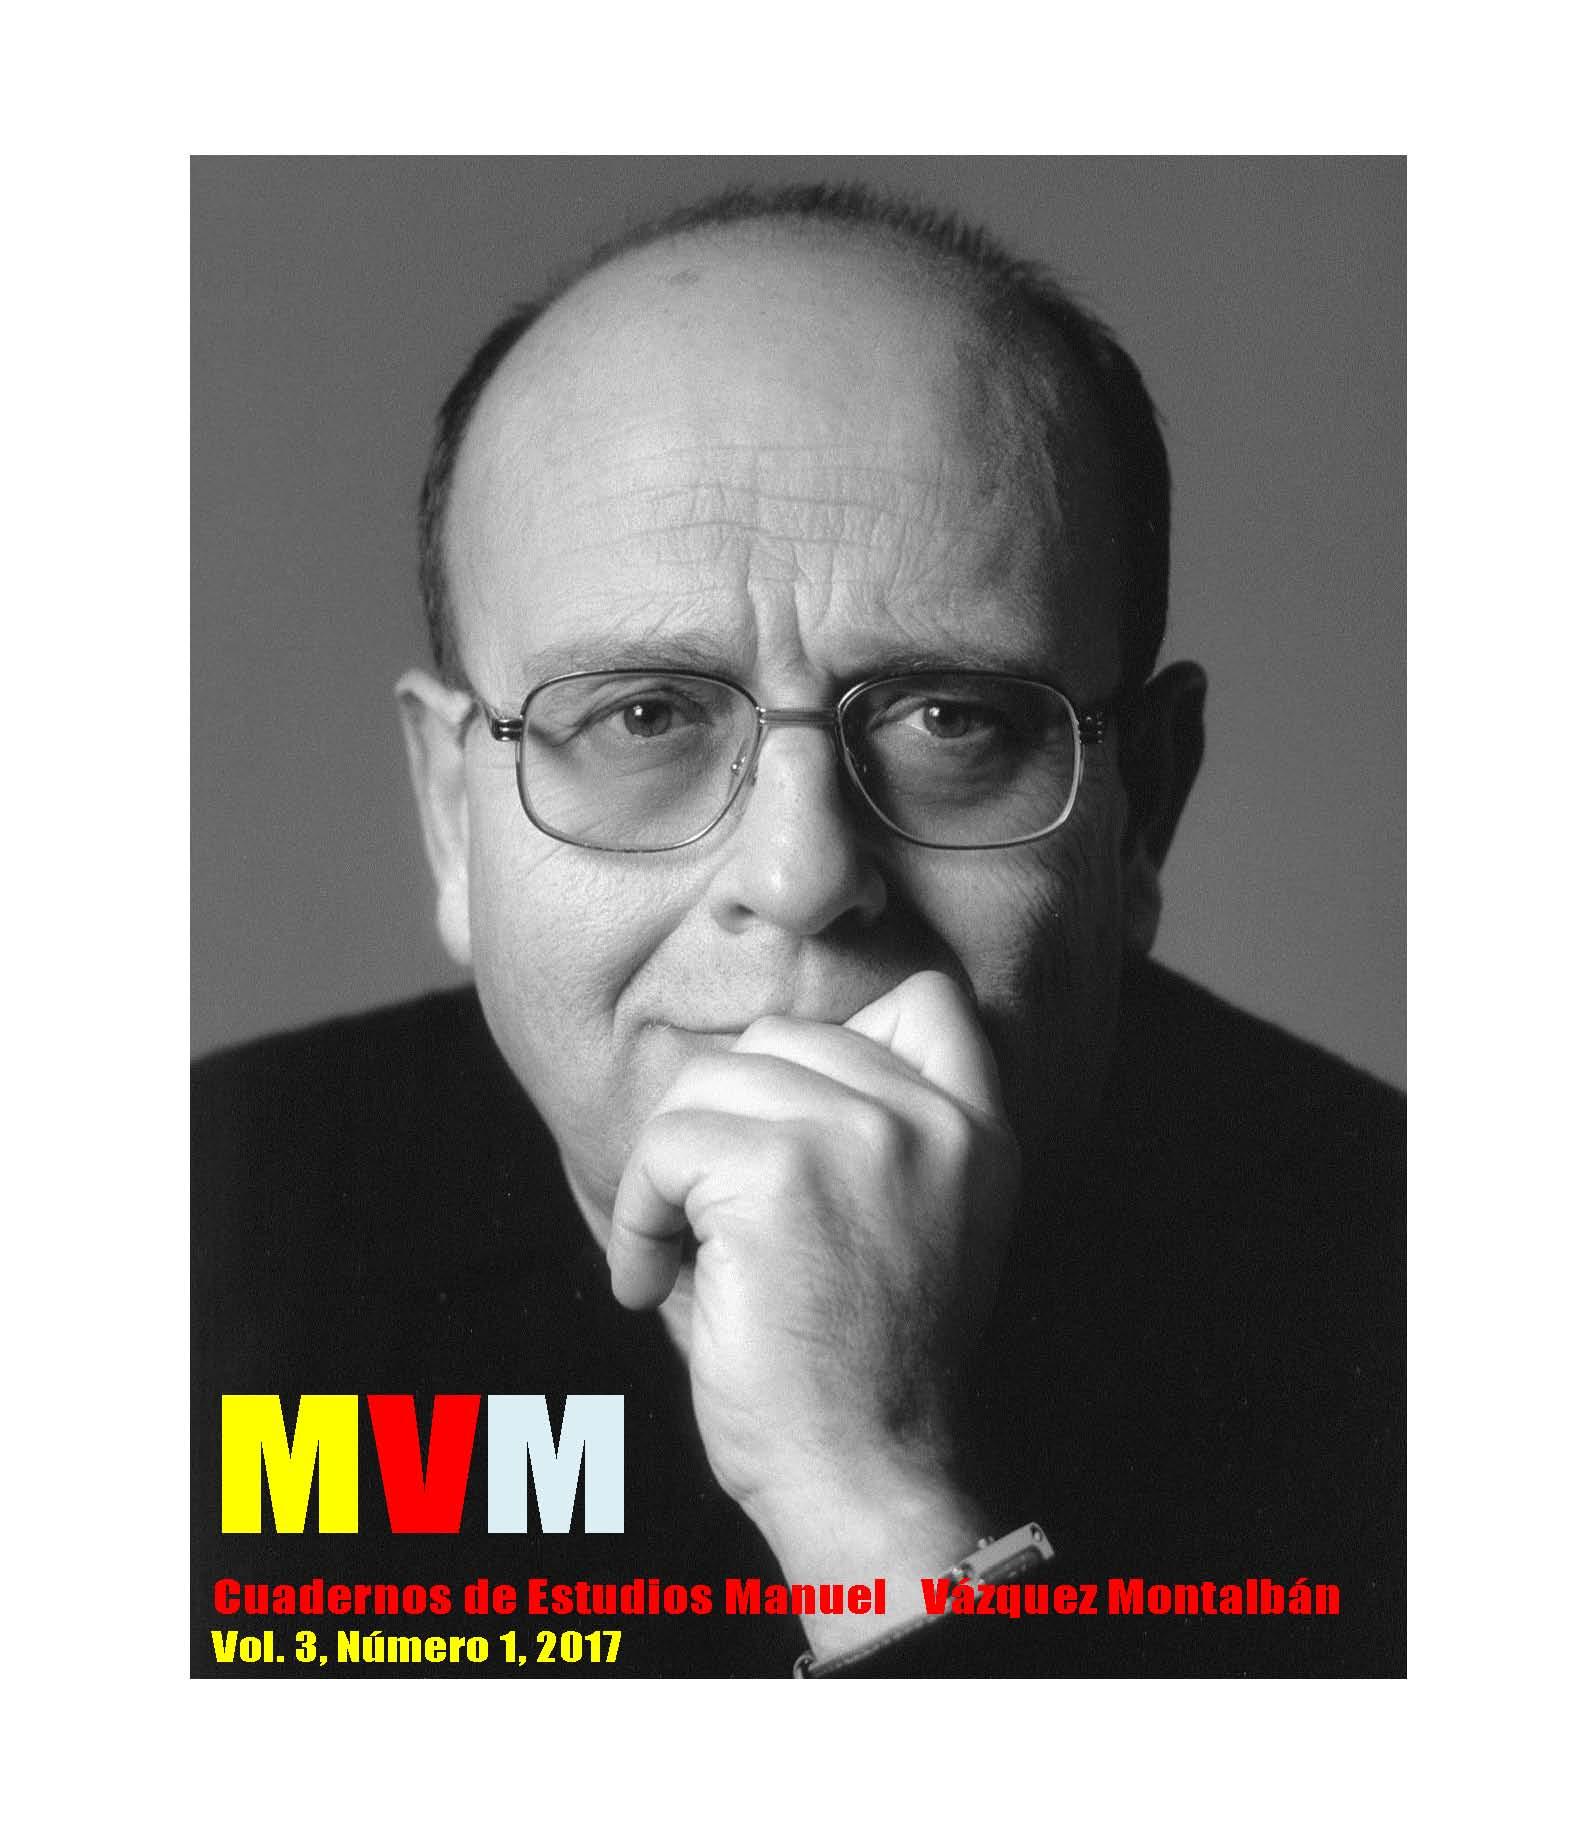 Ver Vol. 3 Núm. 1 (2017): MVM: Cuadernos de Estudios Manuel Vázquez Montalbán